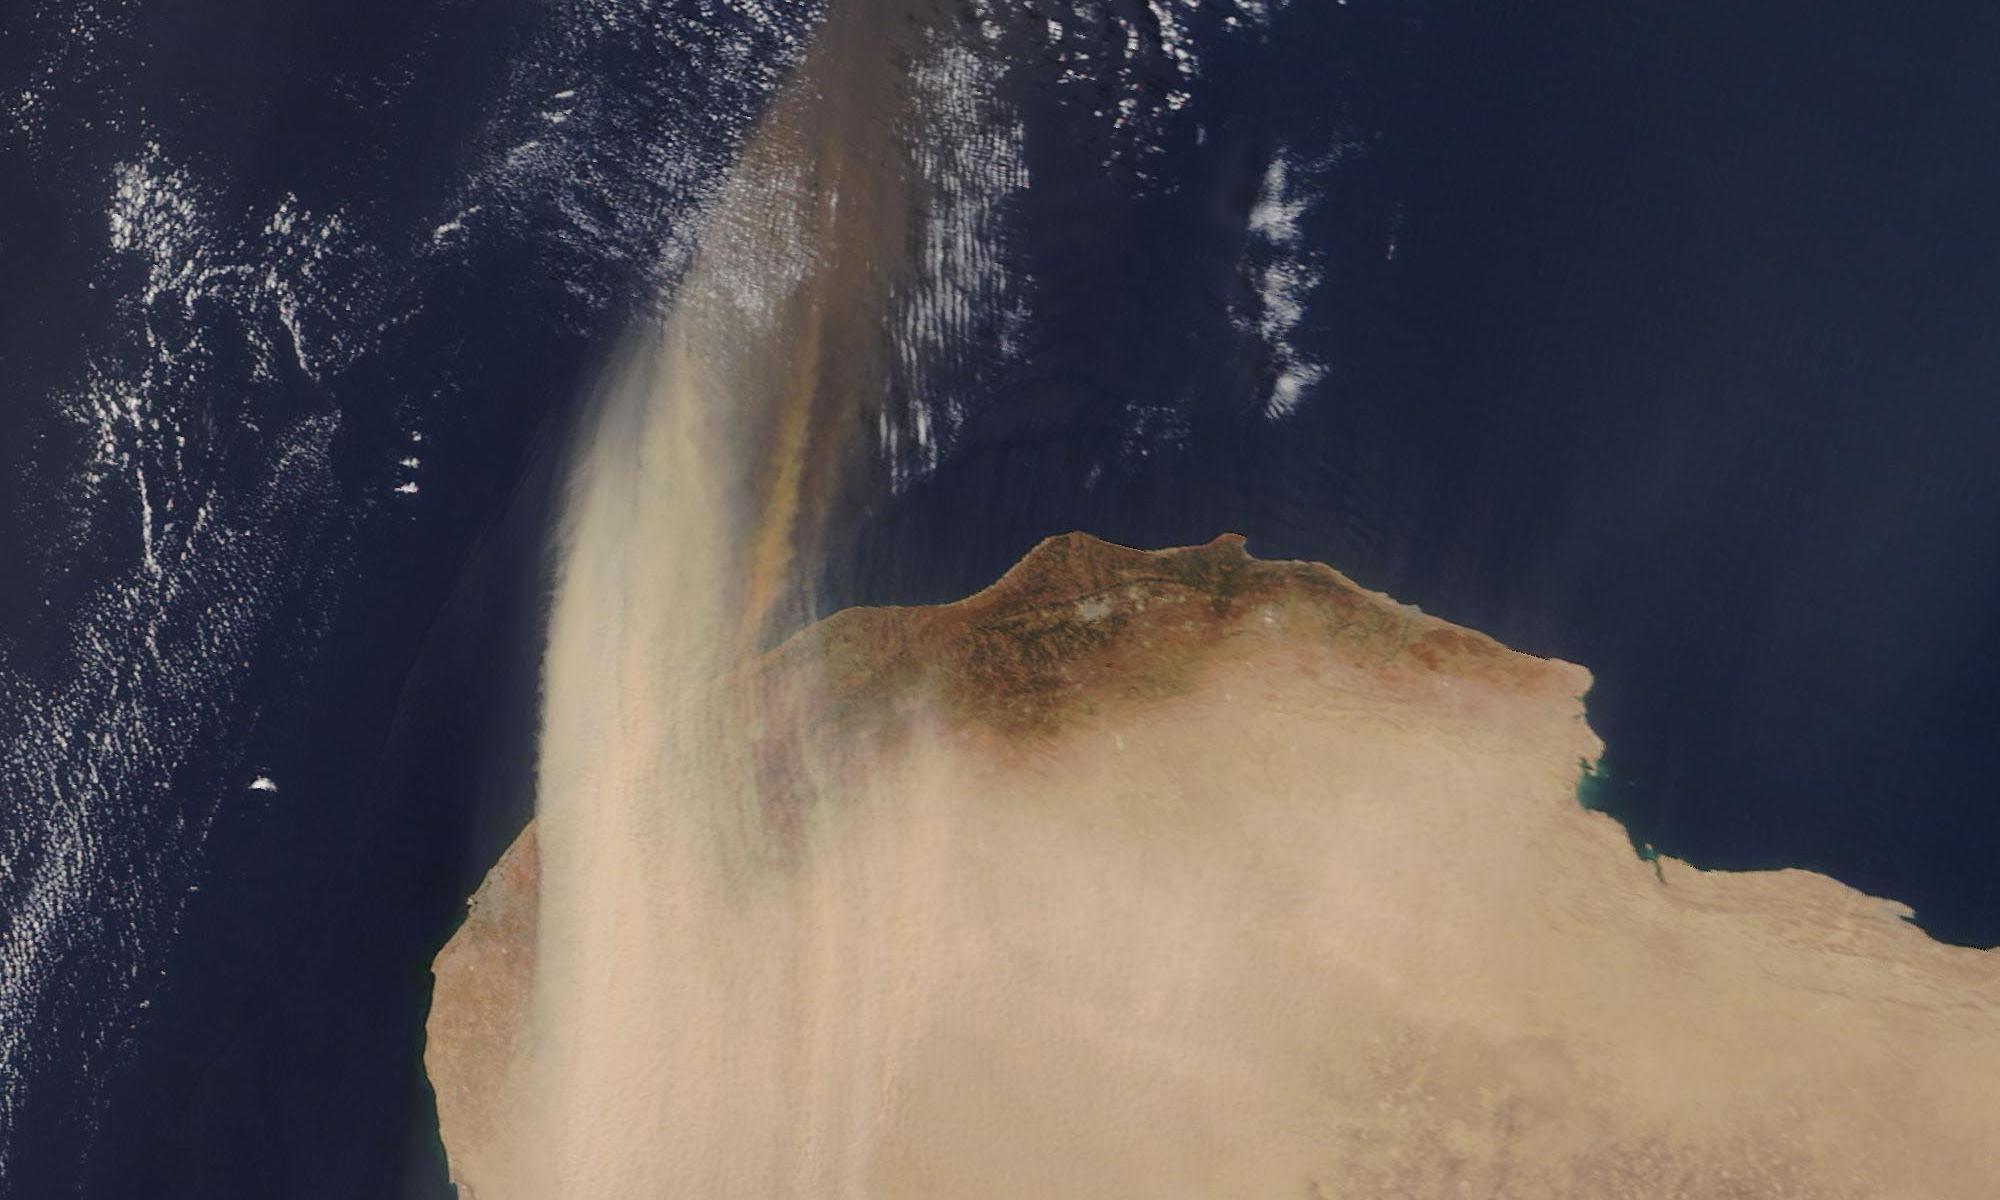 TE Lawrence dust-storm notes enlighten weather crews 100 years on